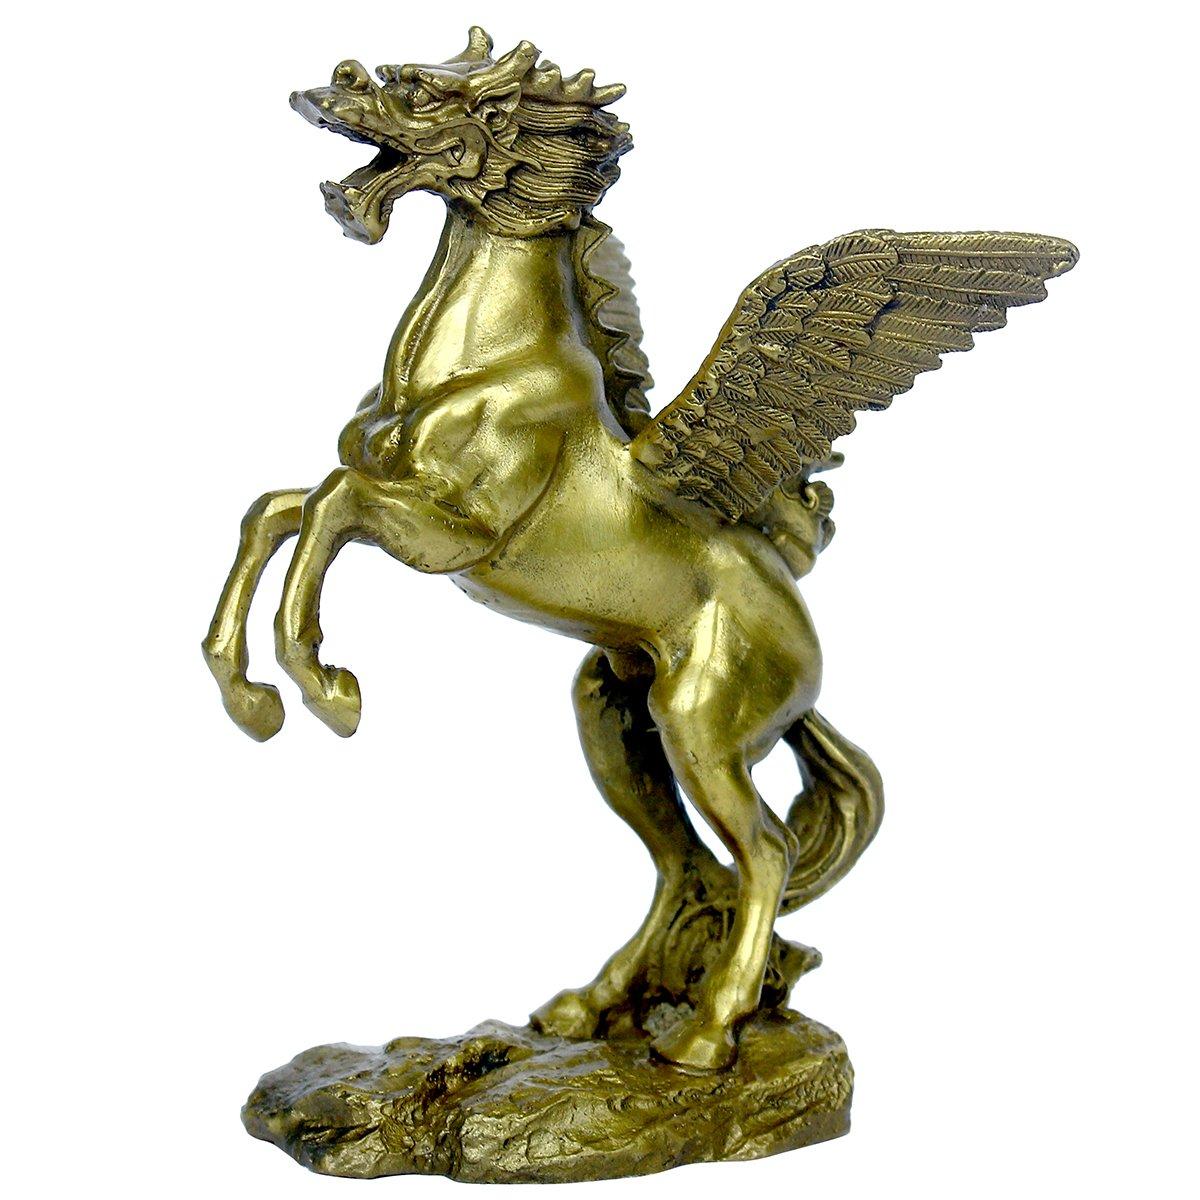 Handmade Brass Pegasus Horse with Dragon Head Statue Home Decor Gift